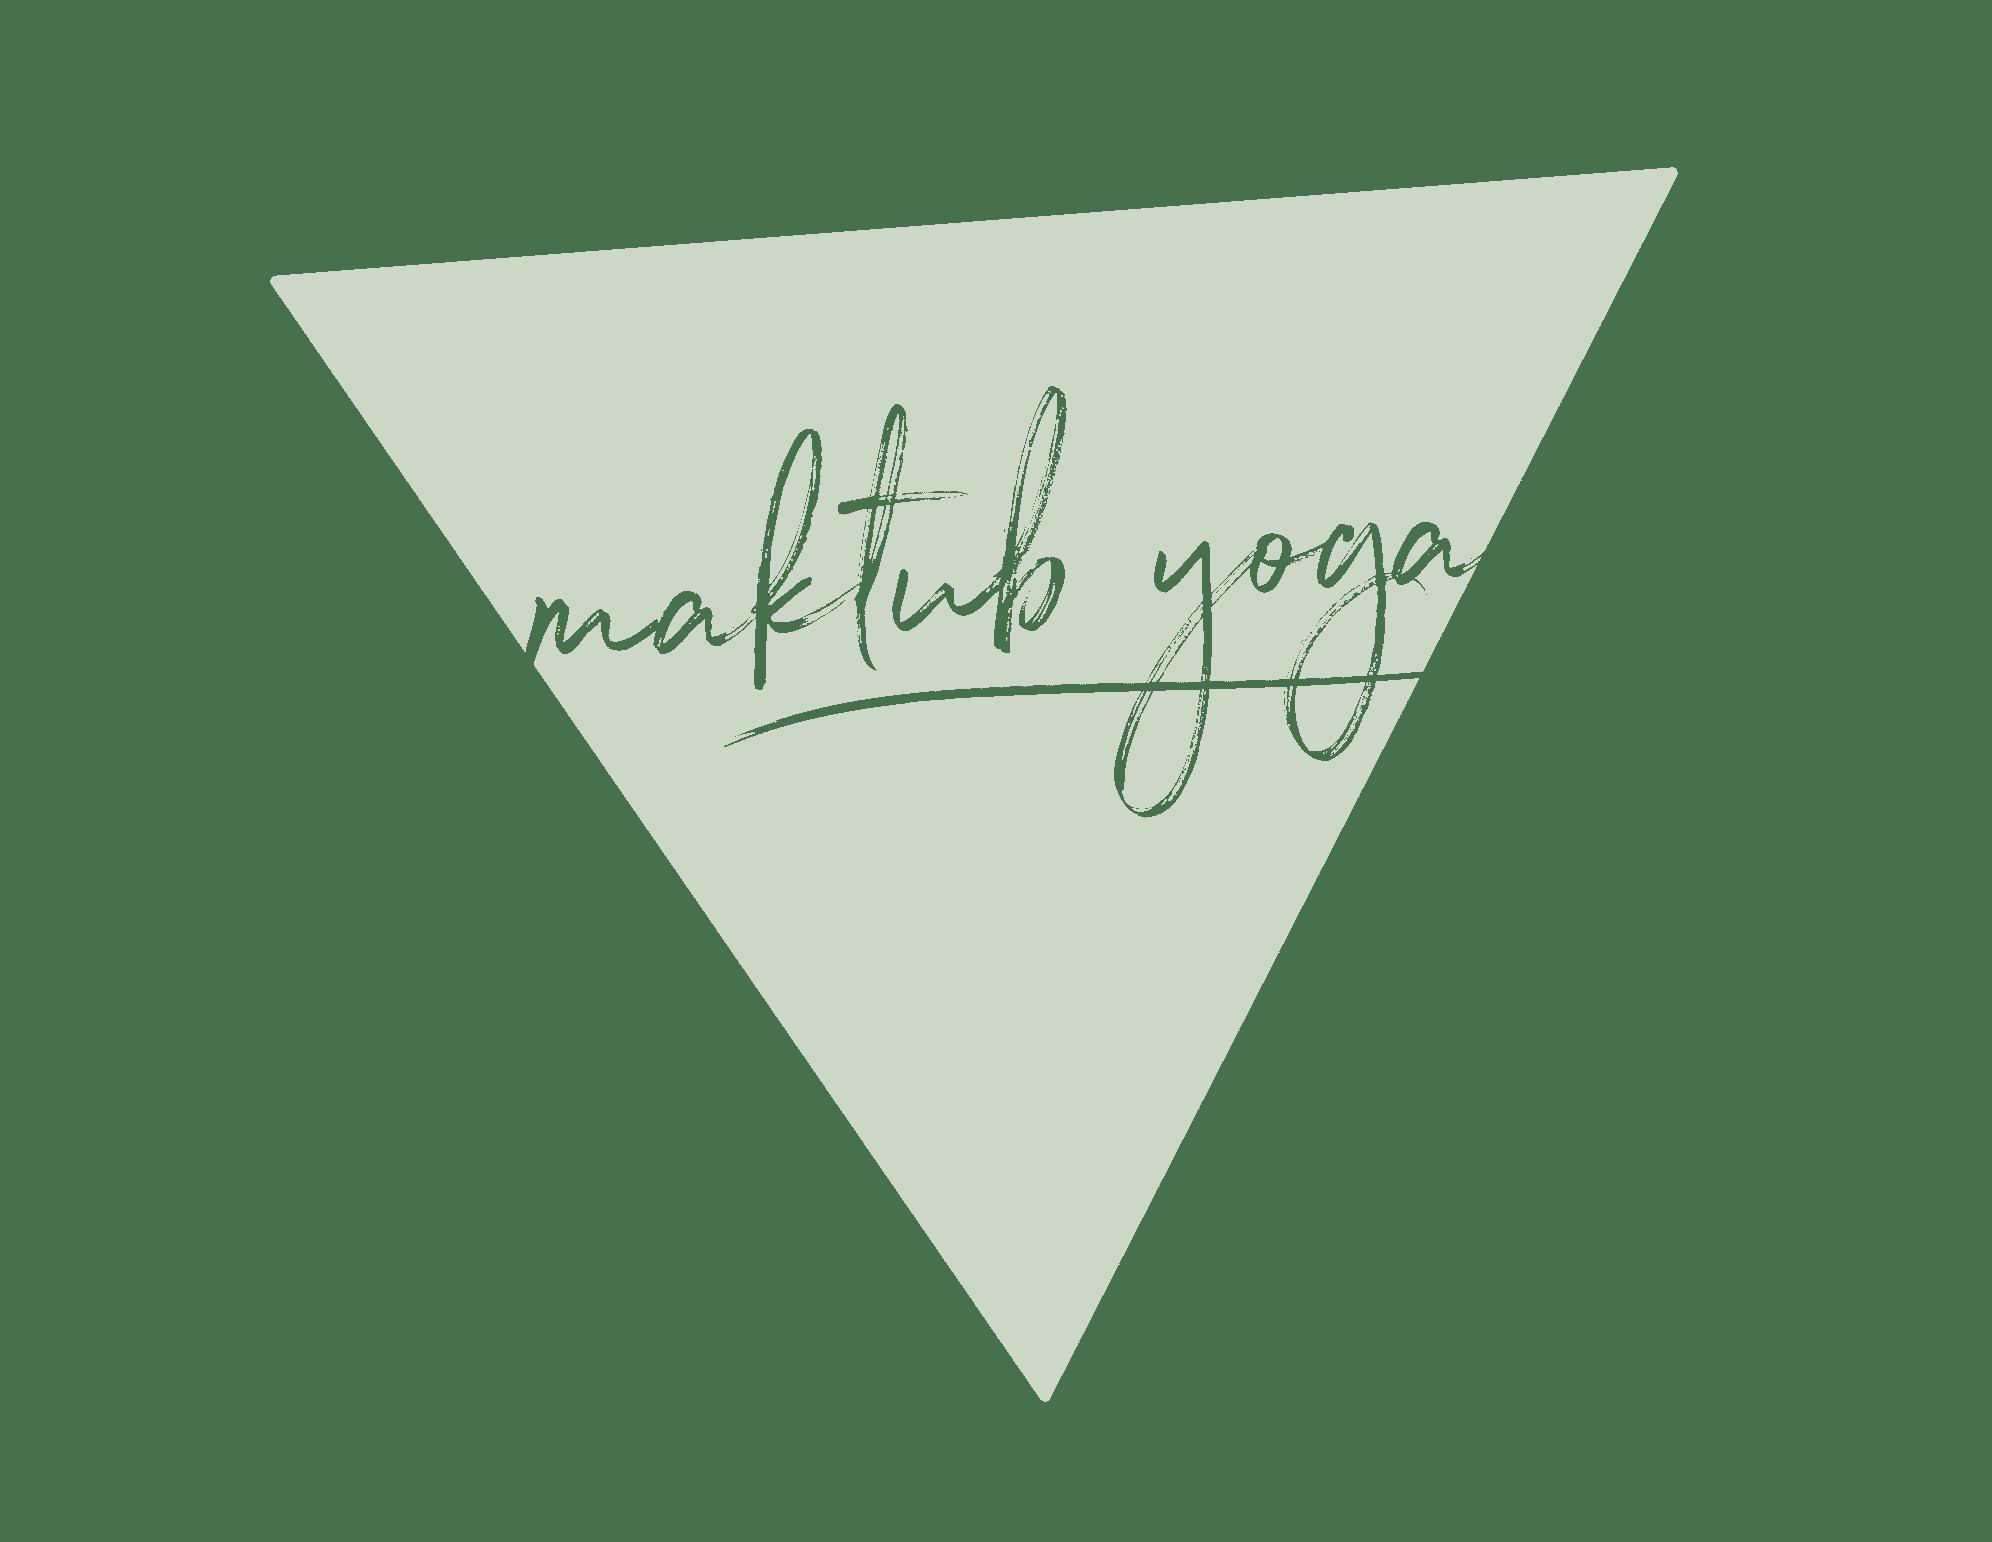 Maktub-Yoga